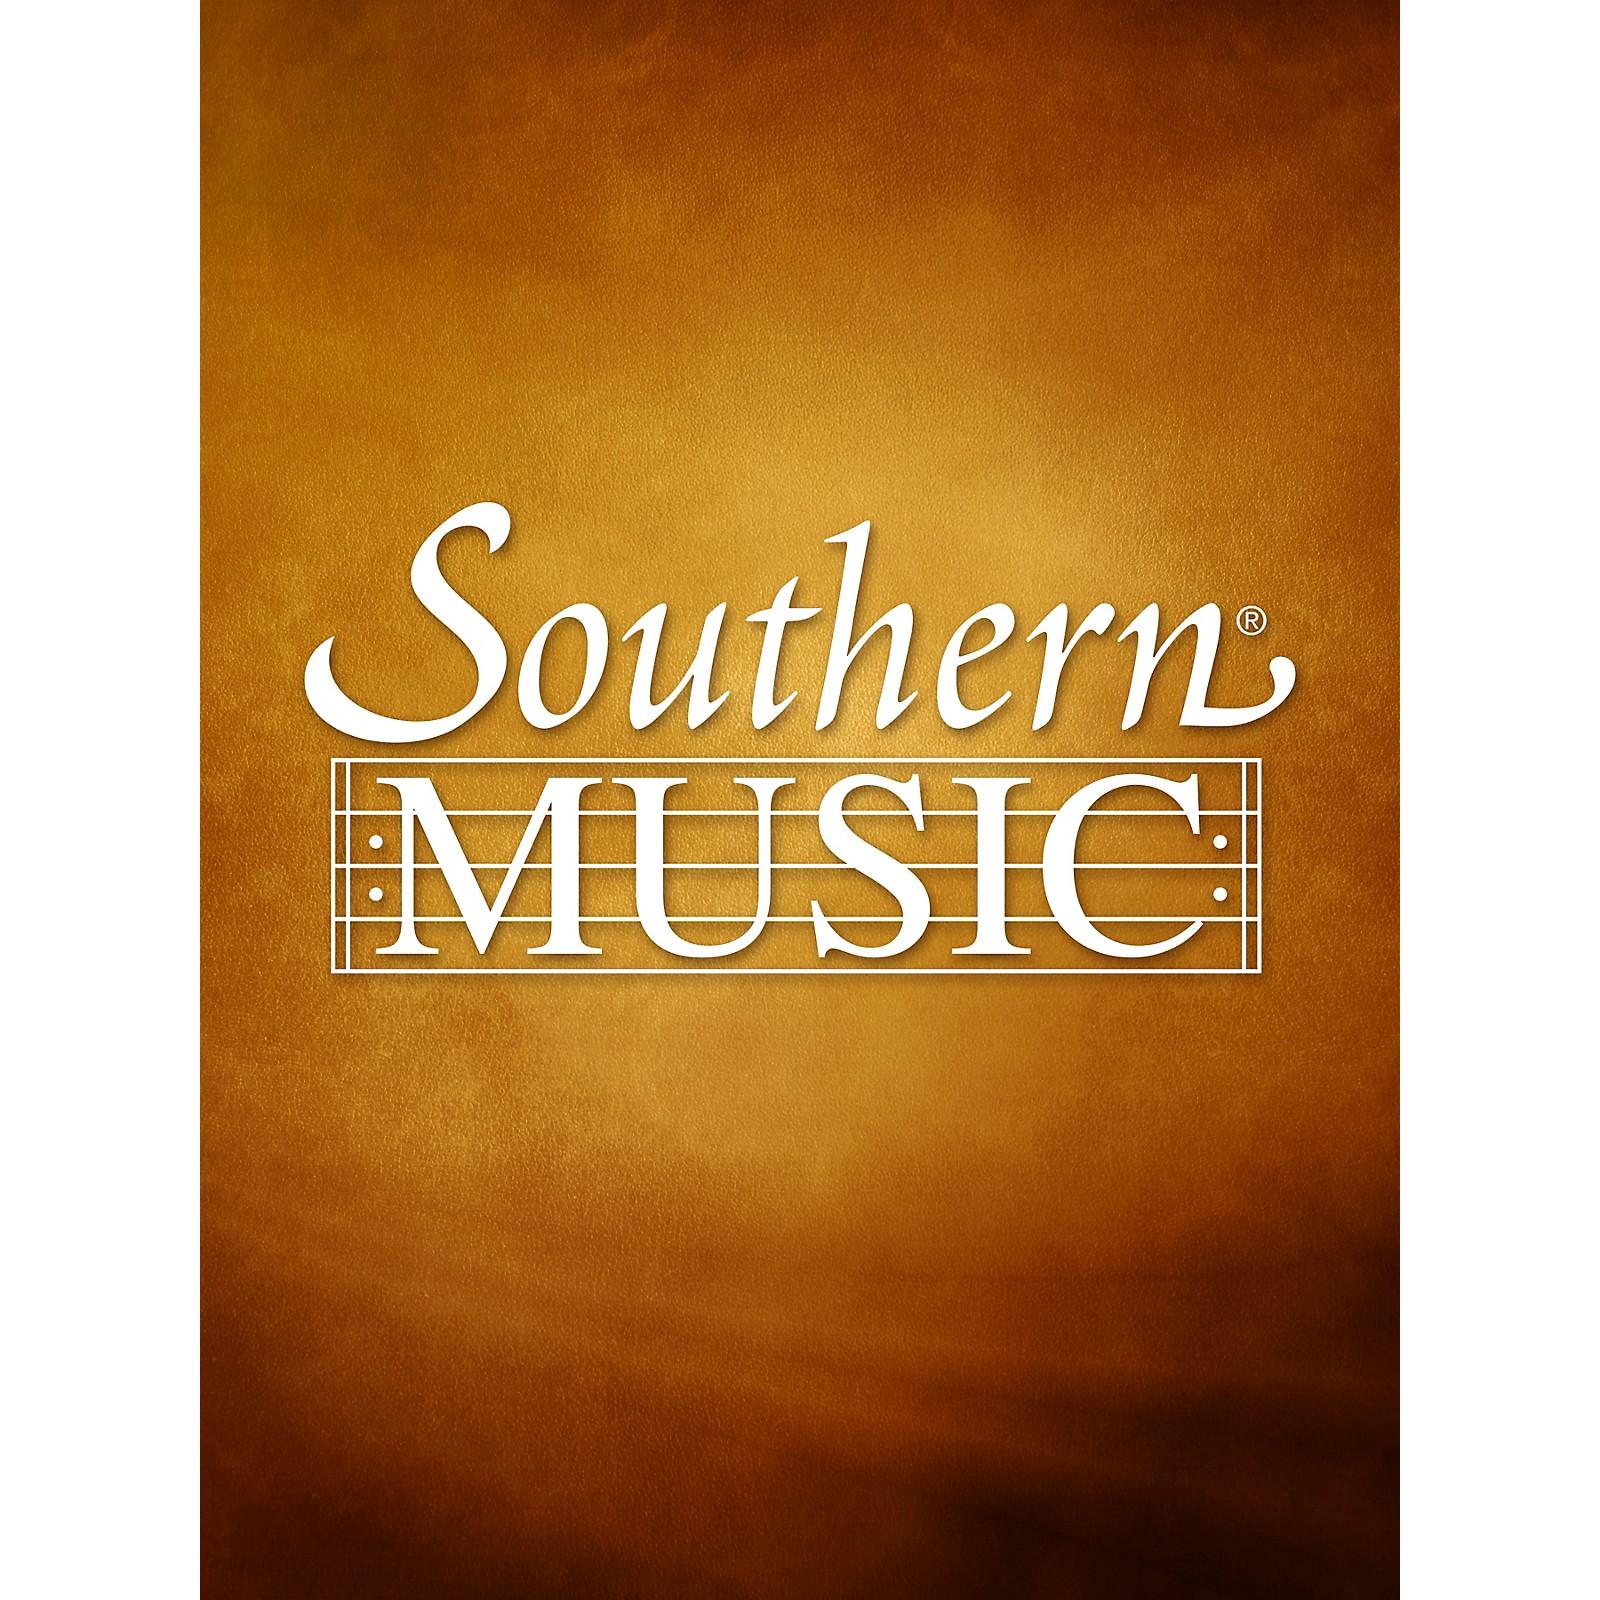 Southern Album of Brass Sextets (Brass Sextet) Southern Music Series Arranged by John Cacavas